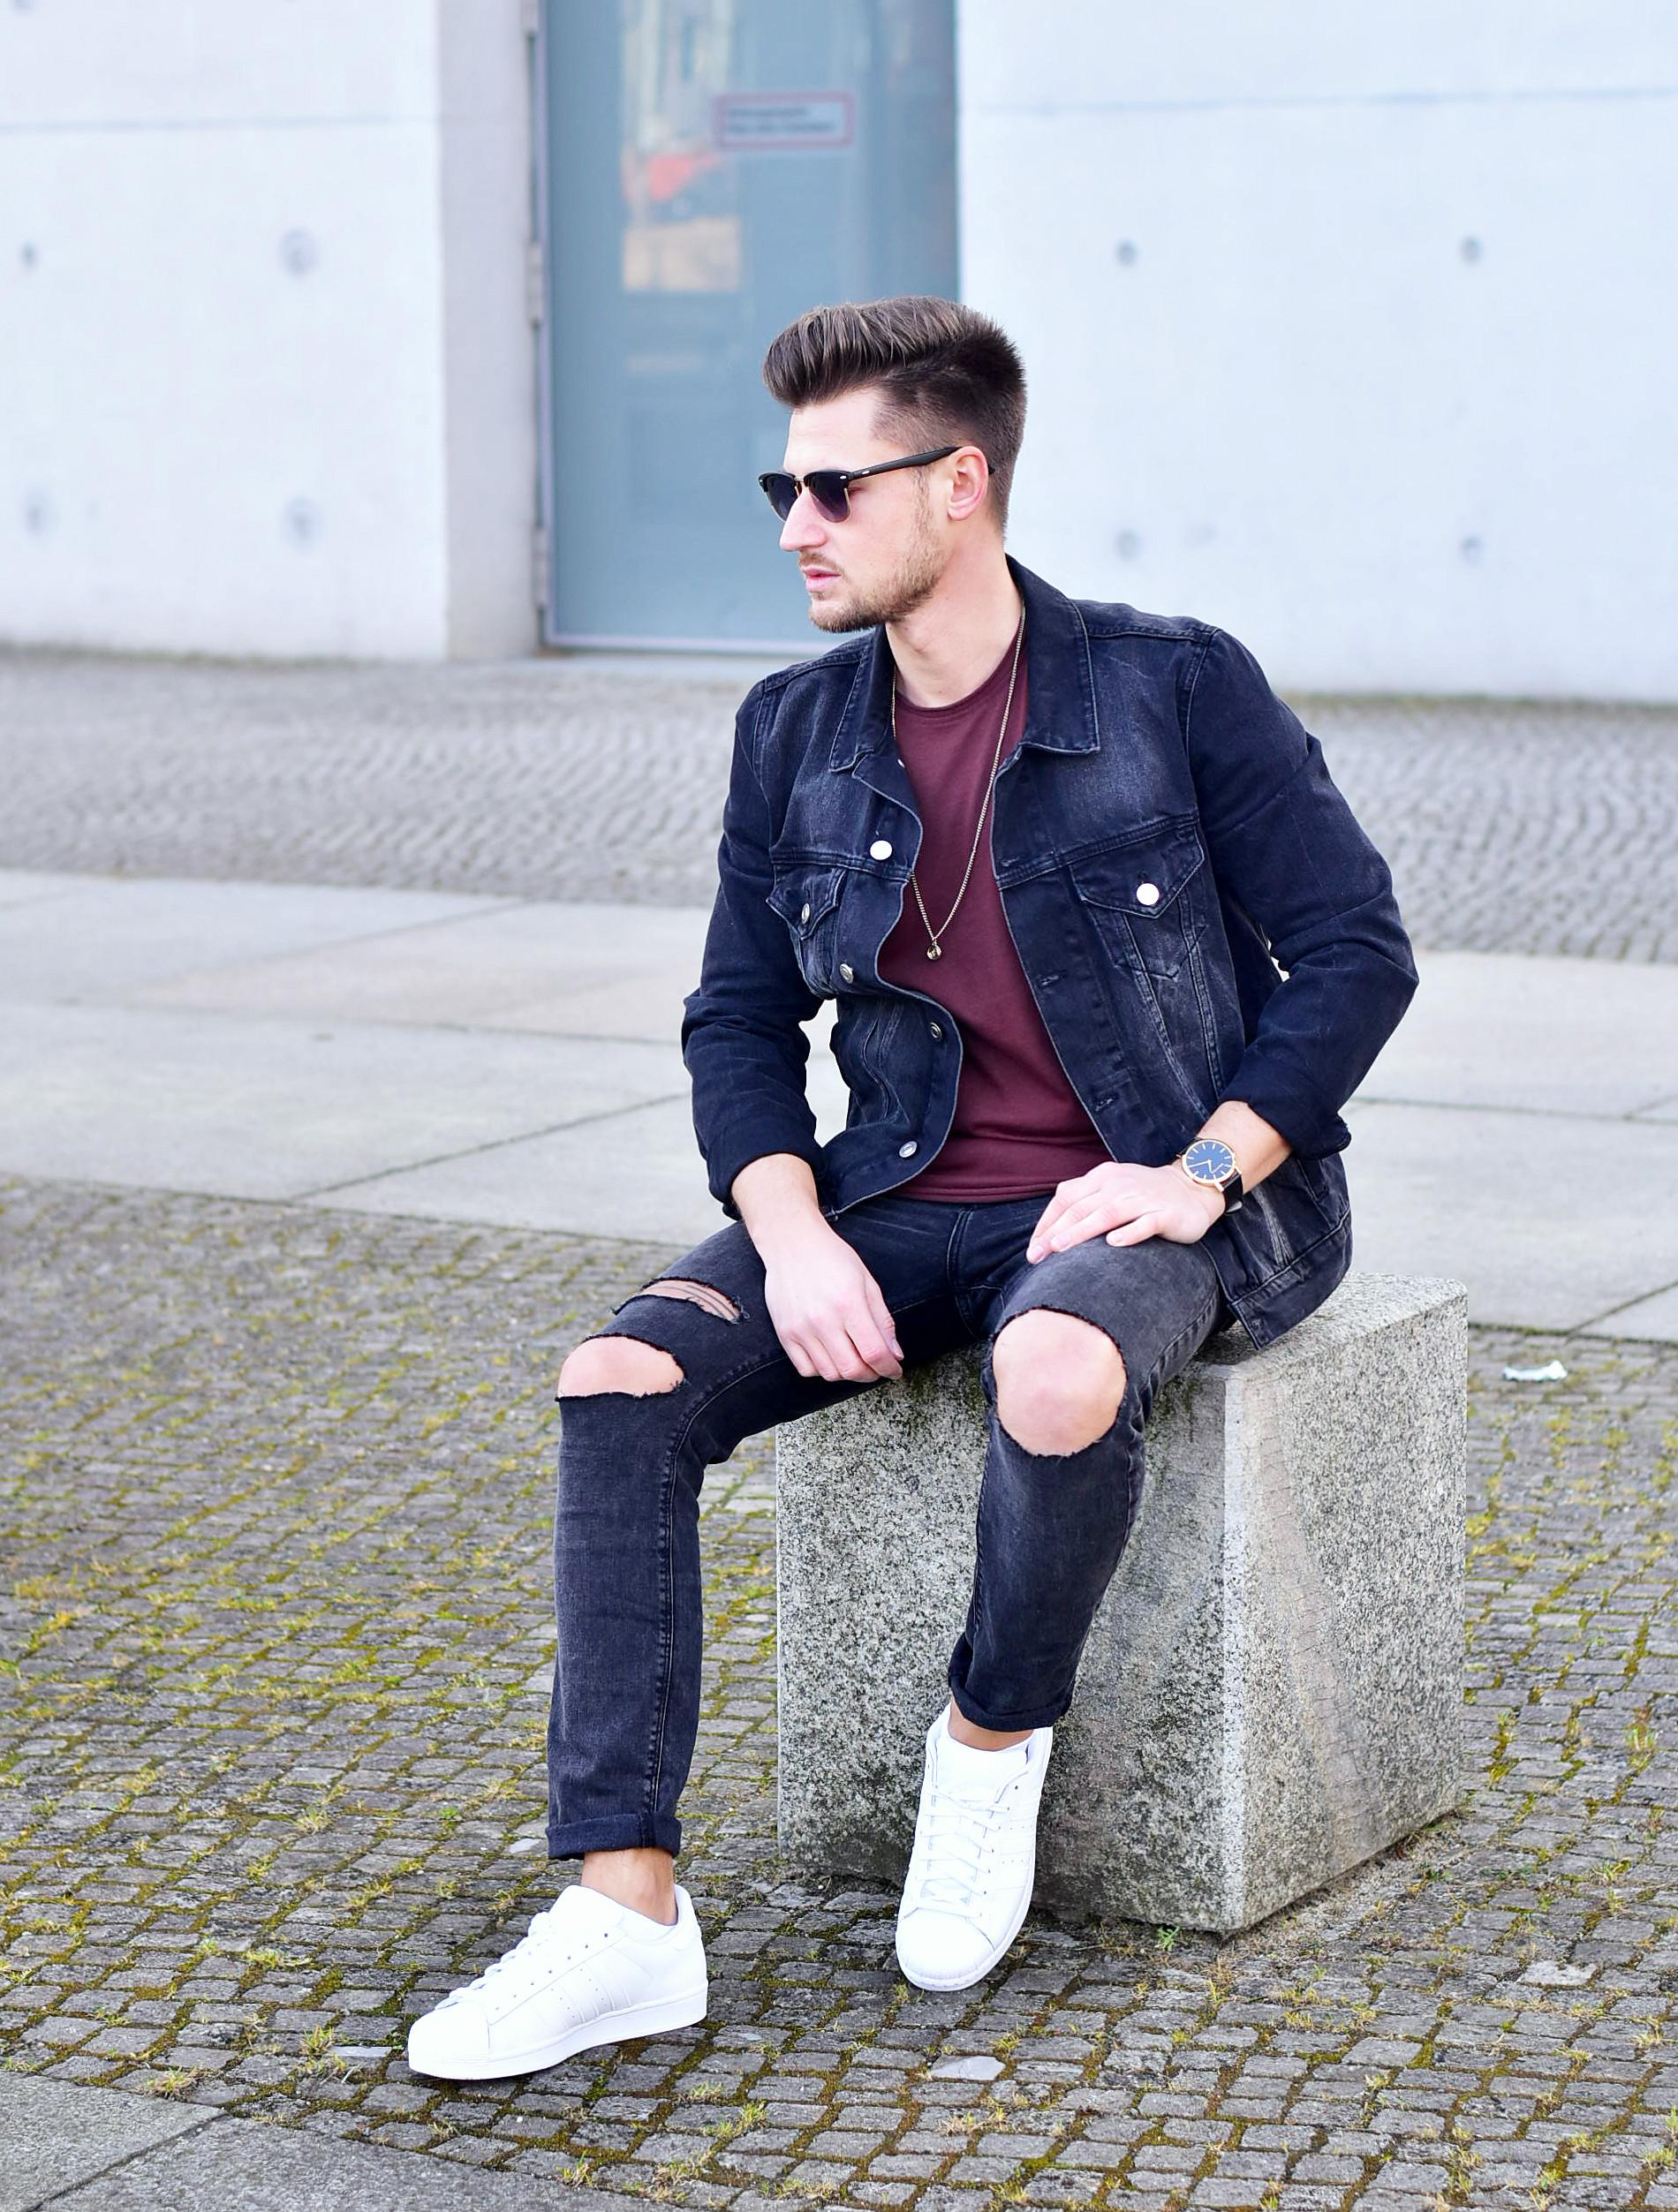 Tommeezjerry-Styleblog-Männerblog-Modeblog-Berlin-Outfit-Jeanslook-Ripped-Jeans-Jeansjacke-Adidas-Superstar-Adidas-Longshirt-Goldschmukc